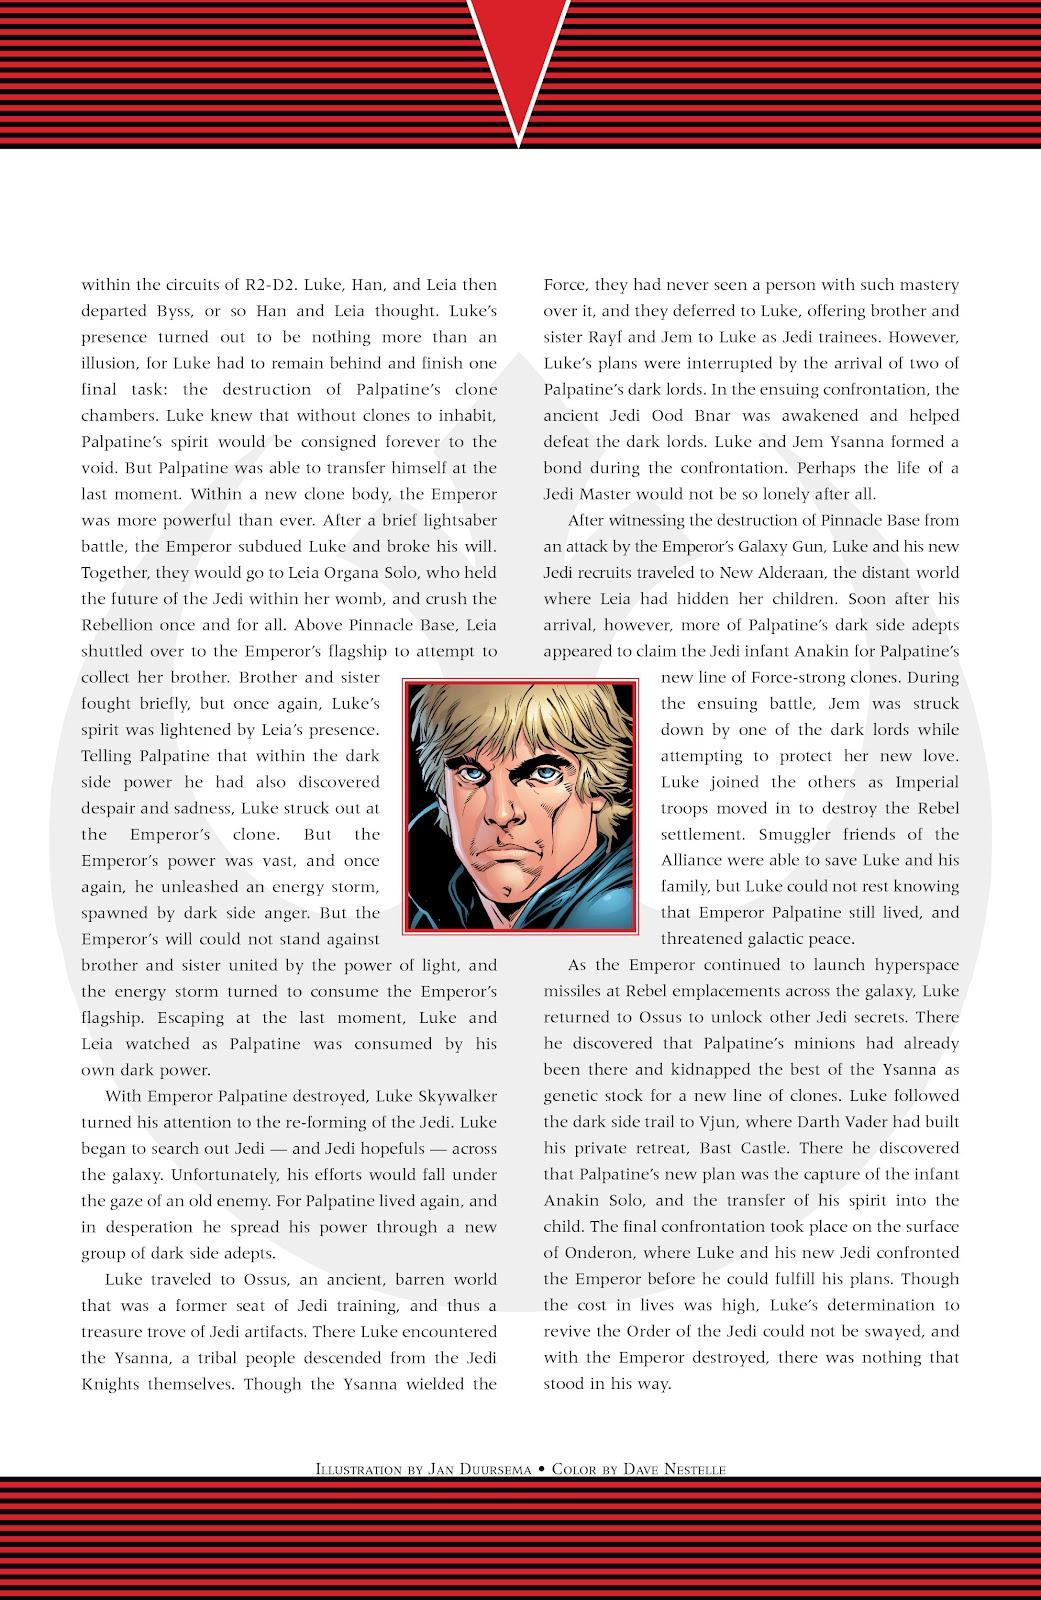 Read online Star Wars: Dark Empire Trilogy comic -  Issue # TPB (Part 4) - 71